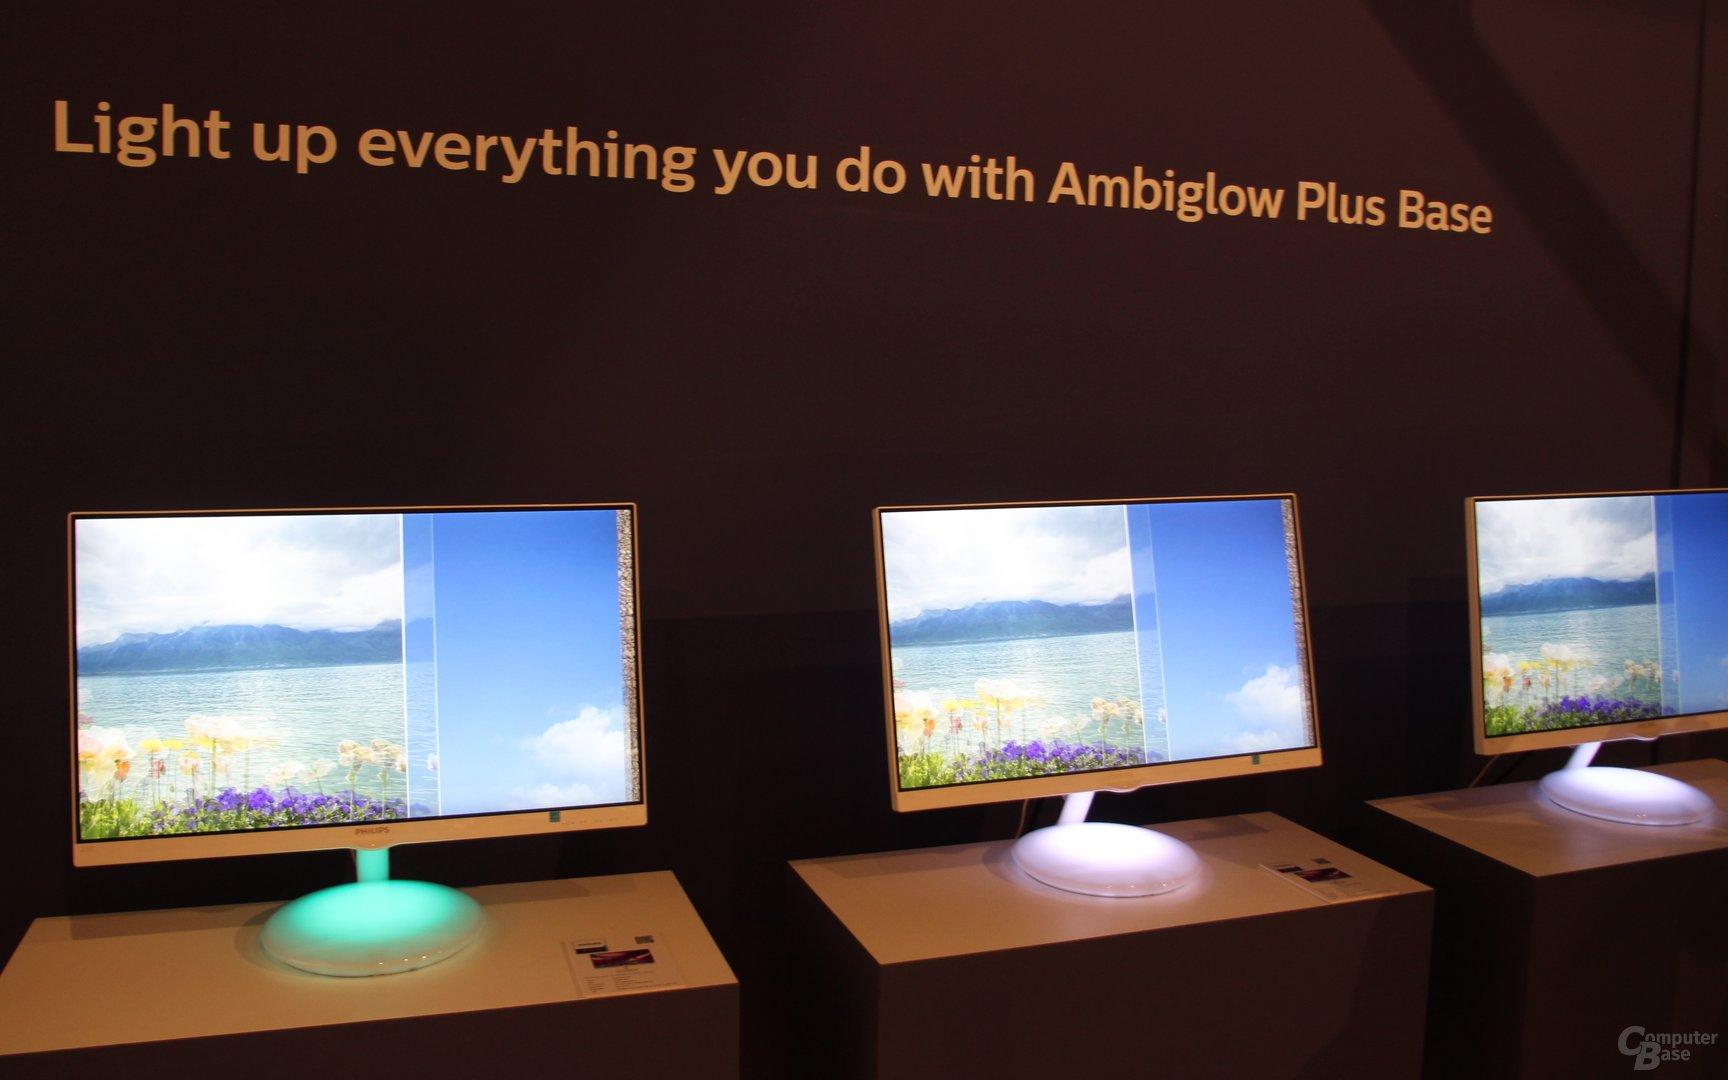 Philips Ambiglow Plus Base